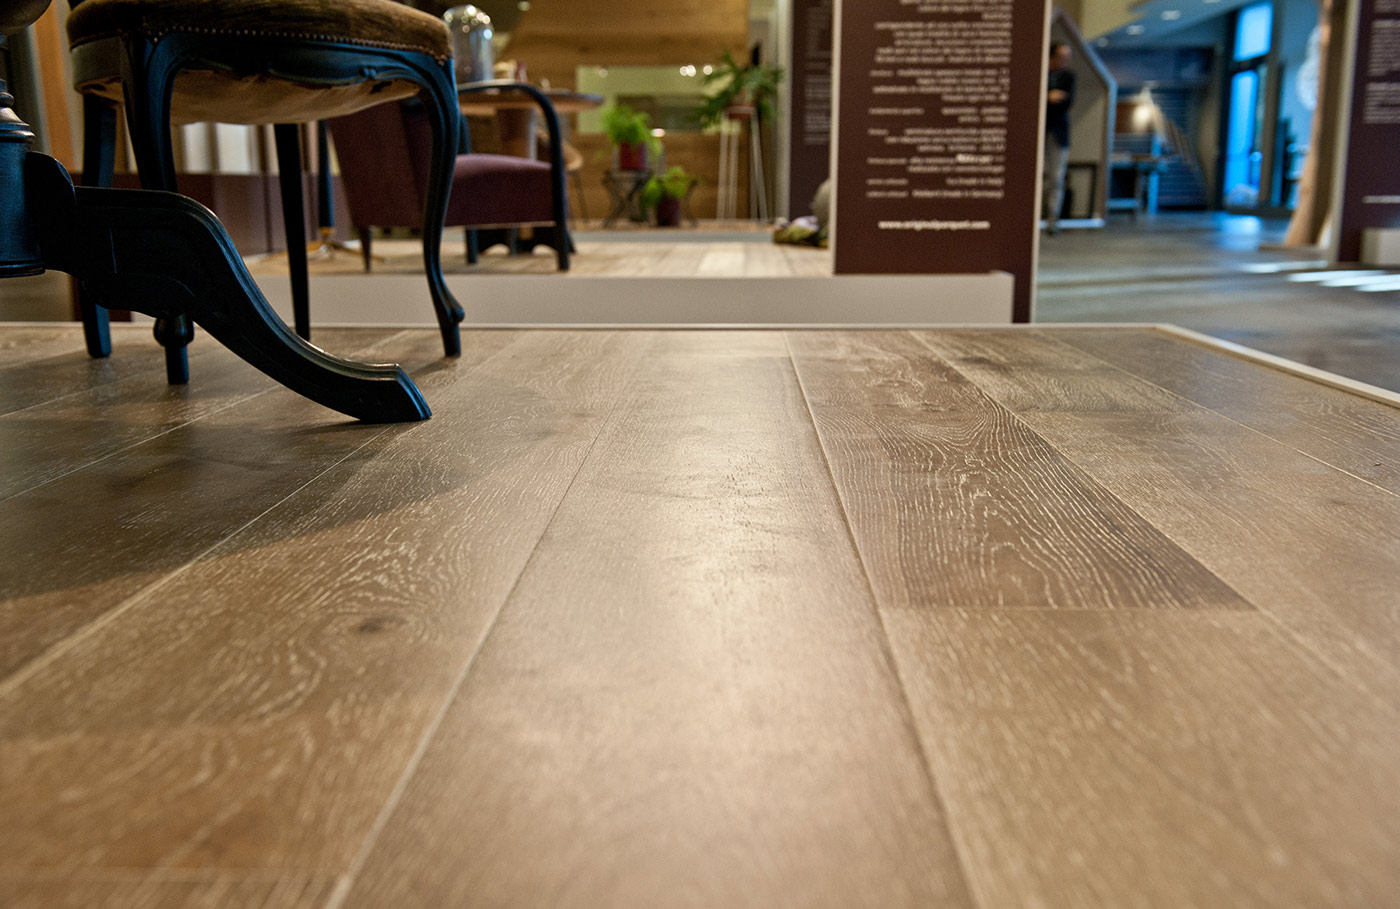 Pavimentazioni in legno u brescia u solo parquet u pavimenti in